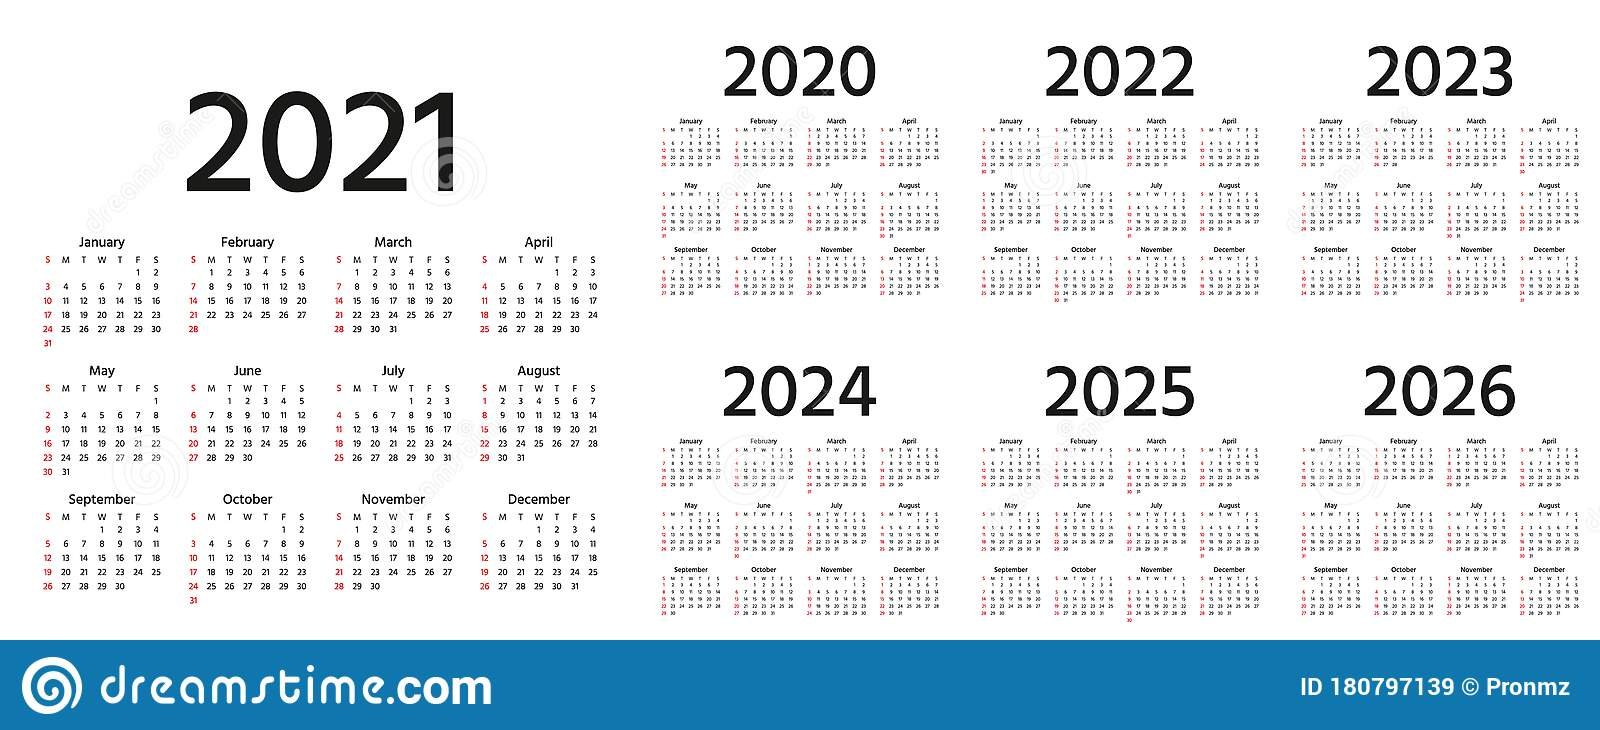 Calendrier Trial 4×4 2022 Calendar 2021 2022 2023 2024 2025 2026 2020 Years. Vector